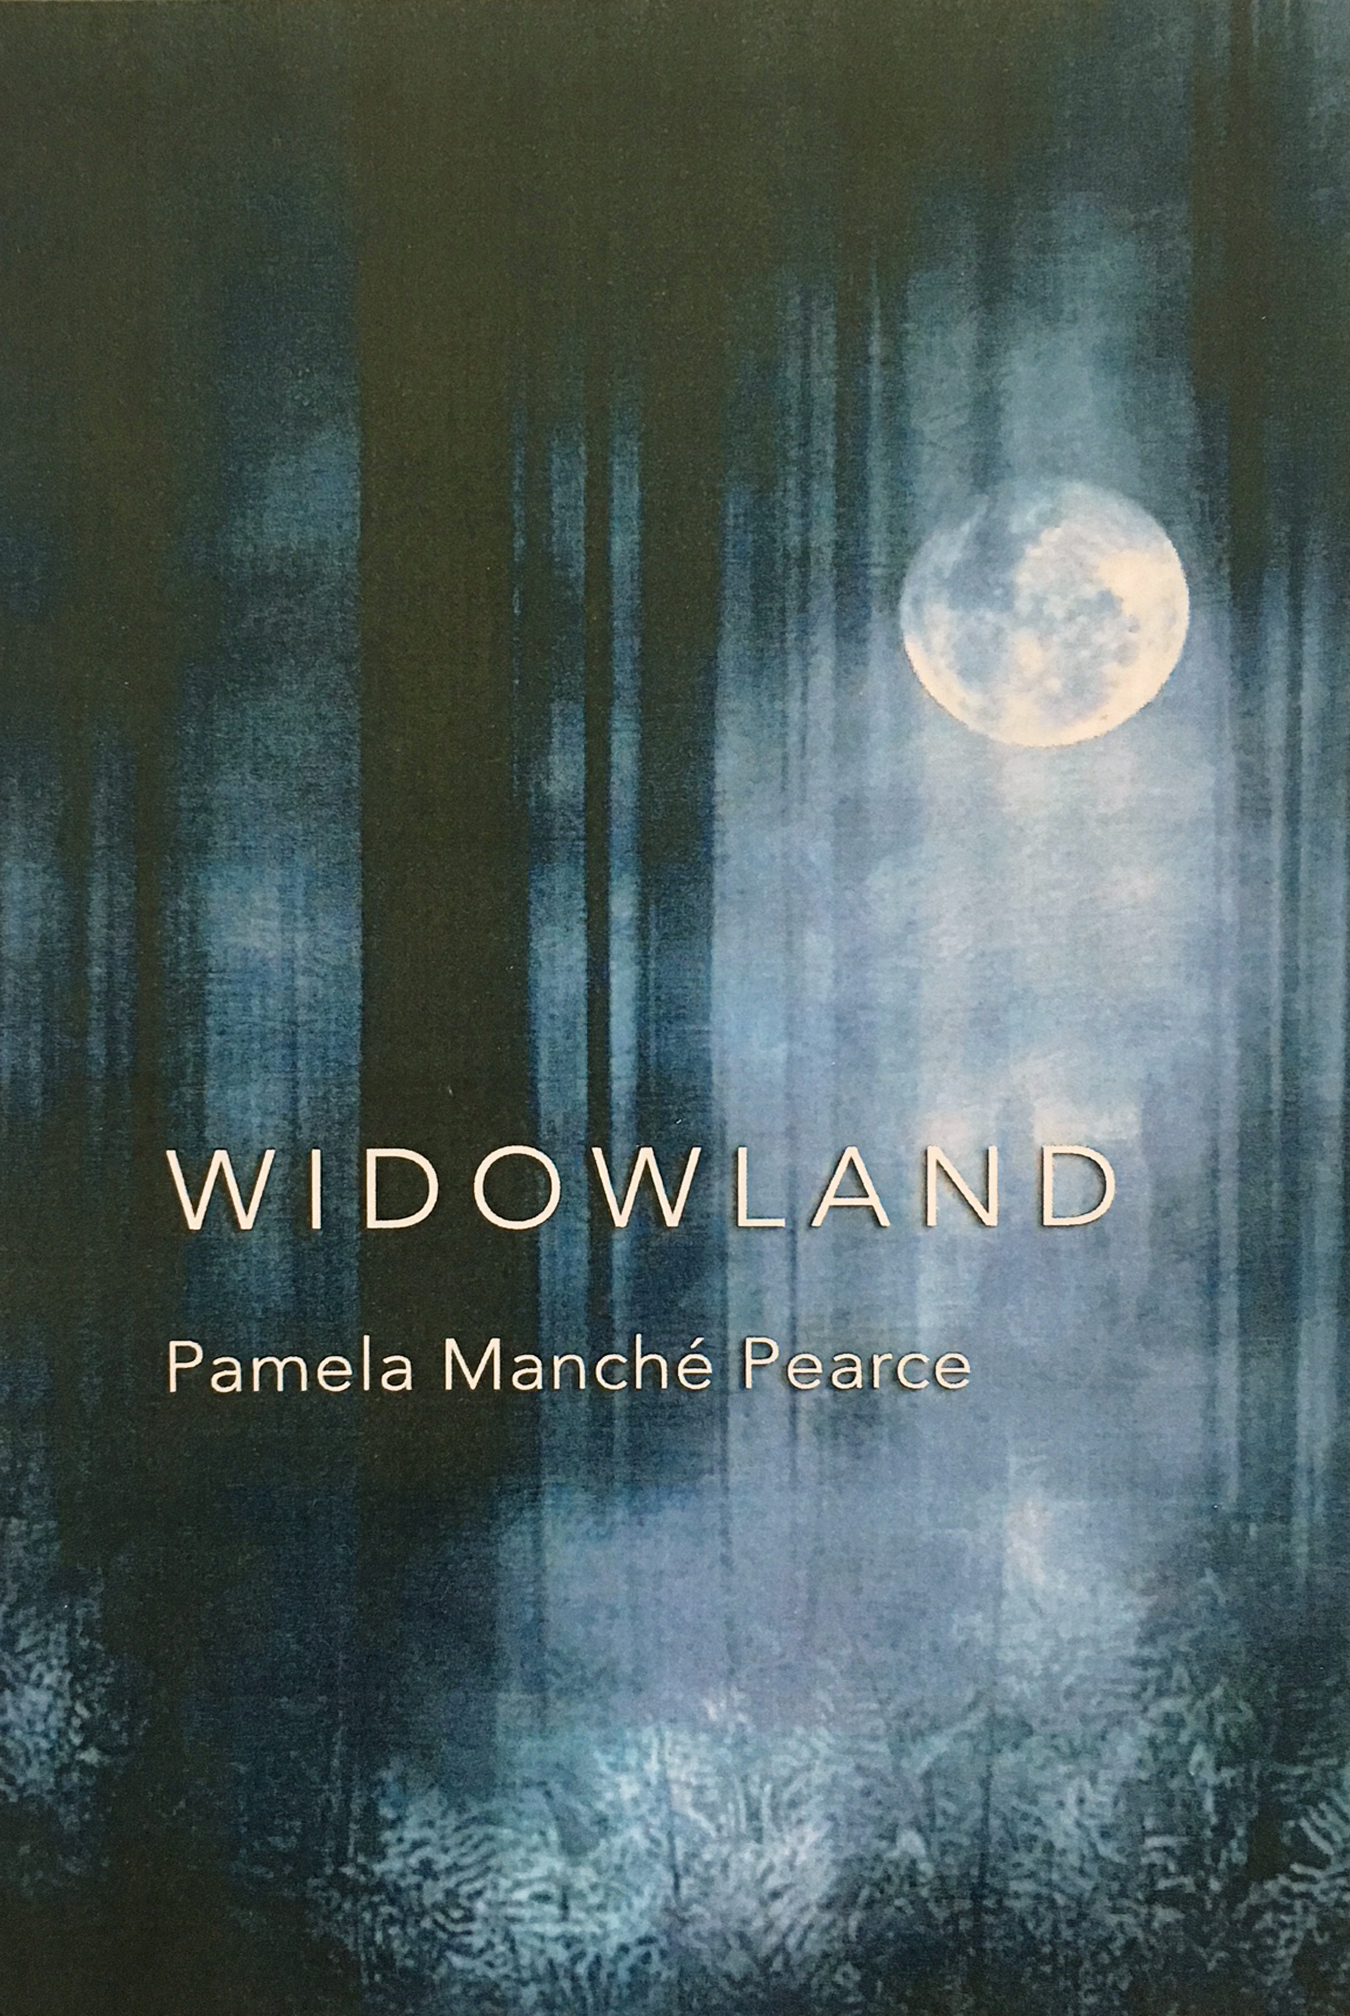 Widowland-bookcover.jpg